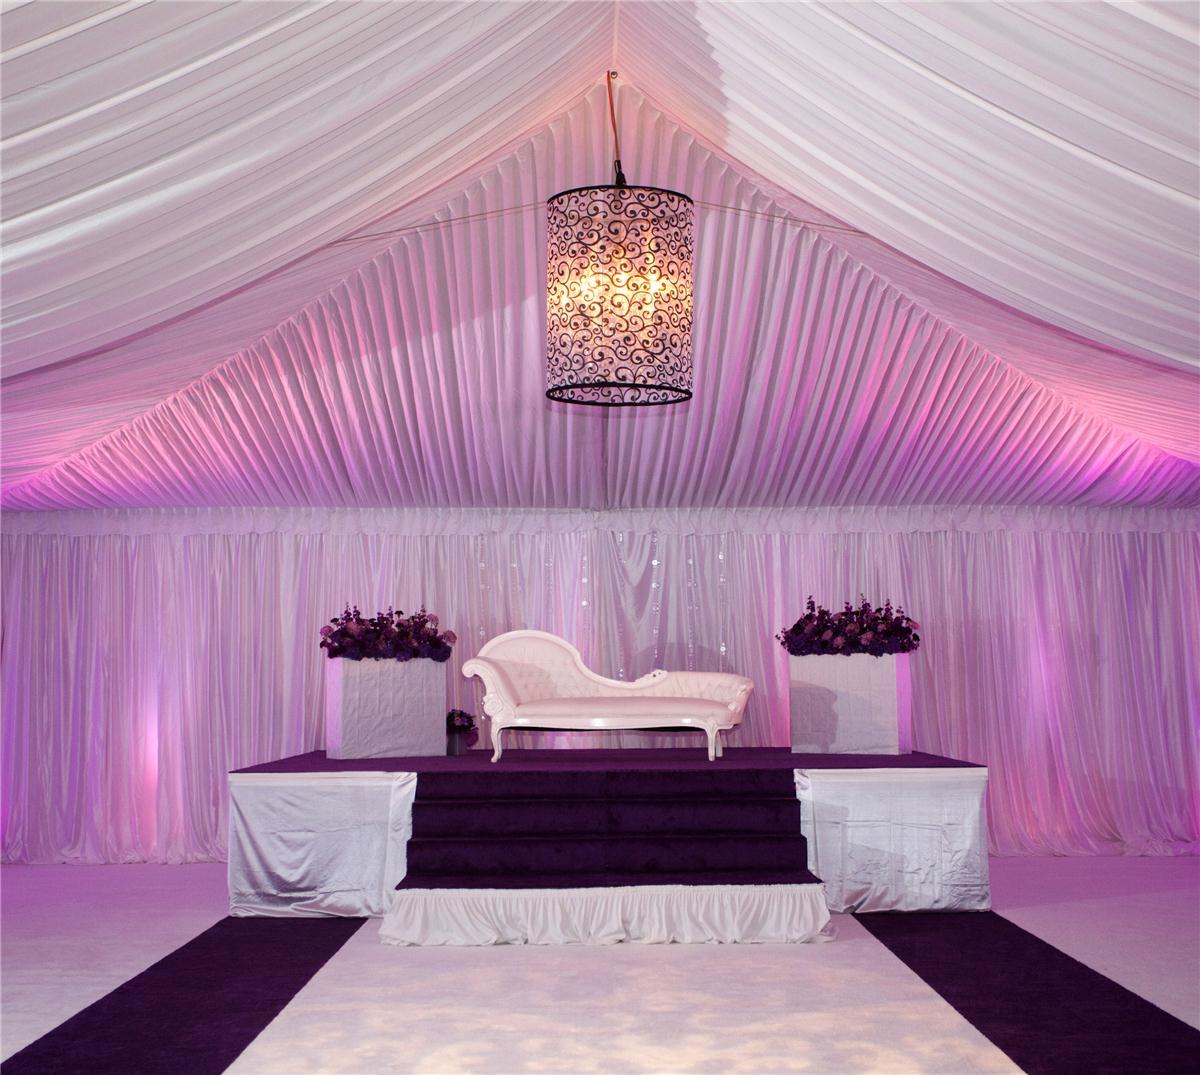 صور كوش افراح جميلة احلي كوشات اعراس (9)